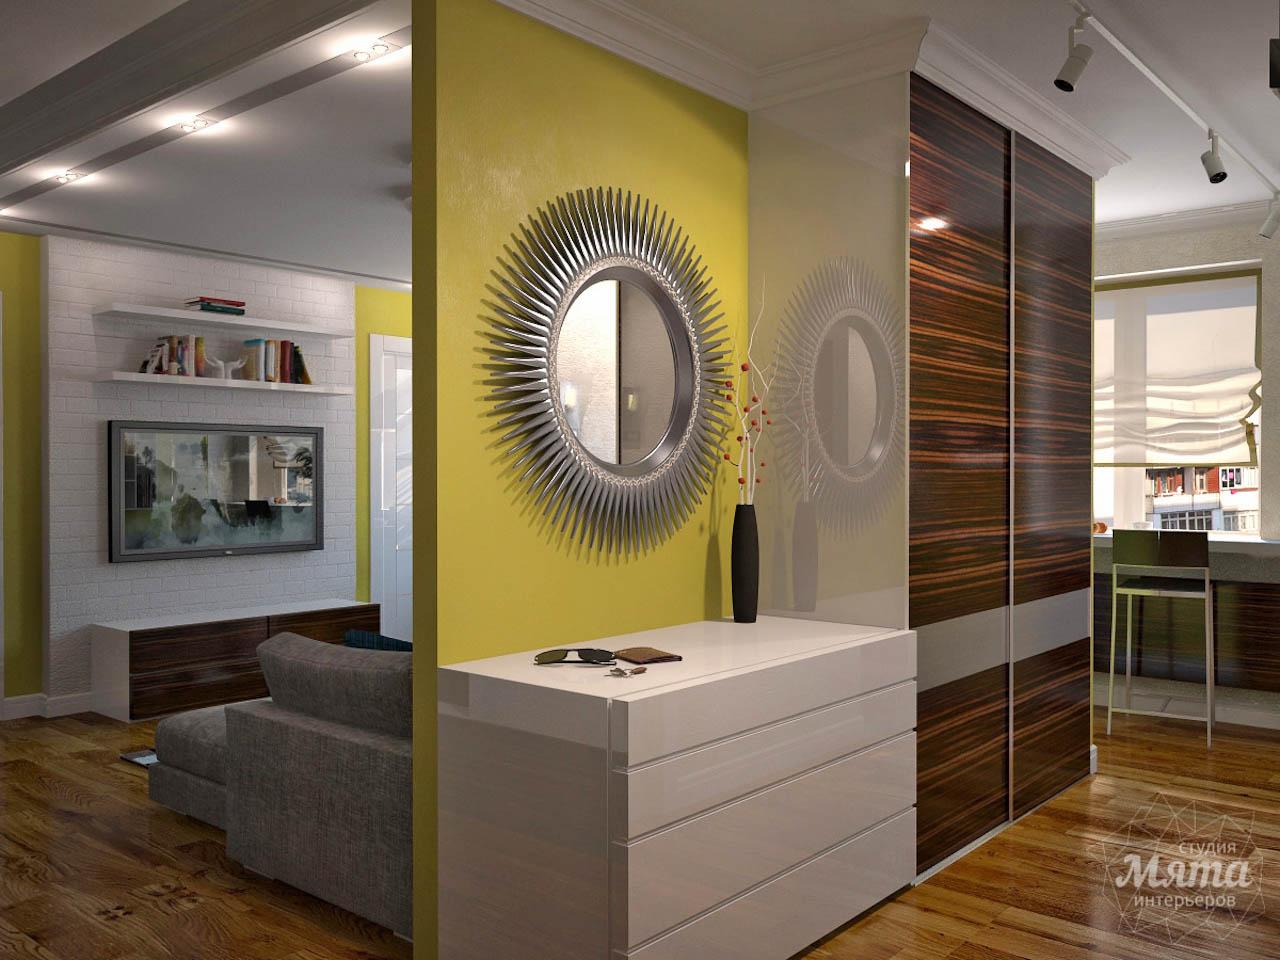 Дизайн интерьера двухкомнатной квартиры по ул. Комсомольская 14 img2054717566